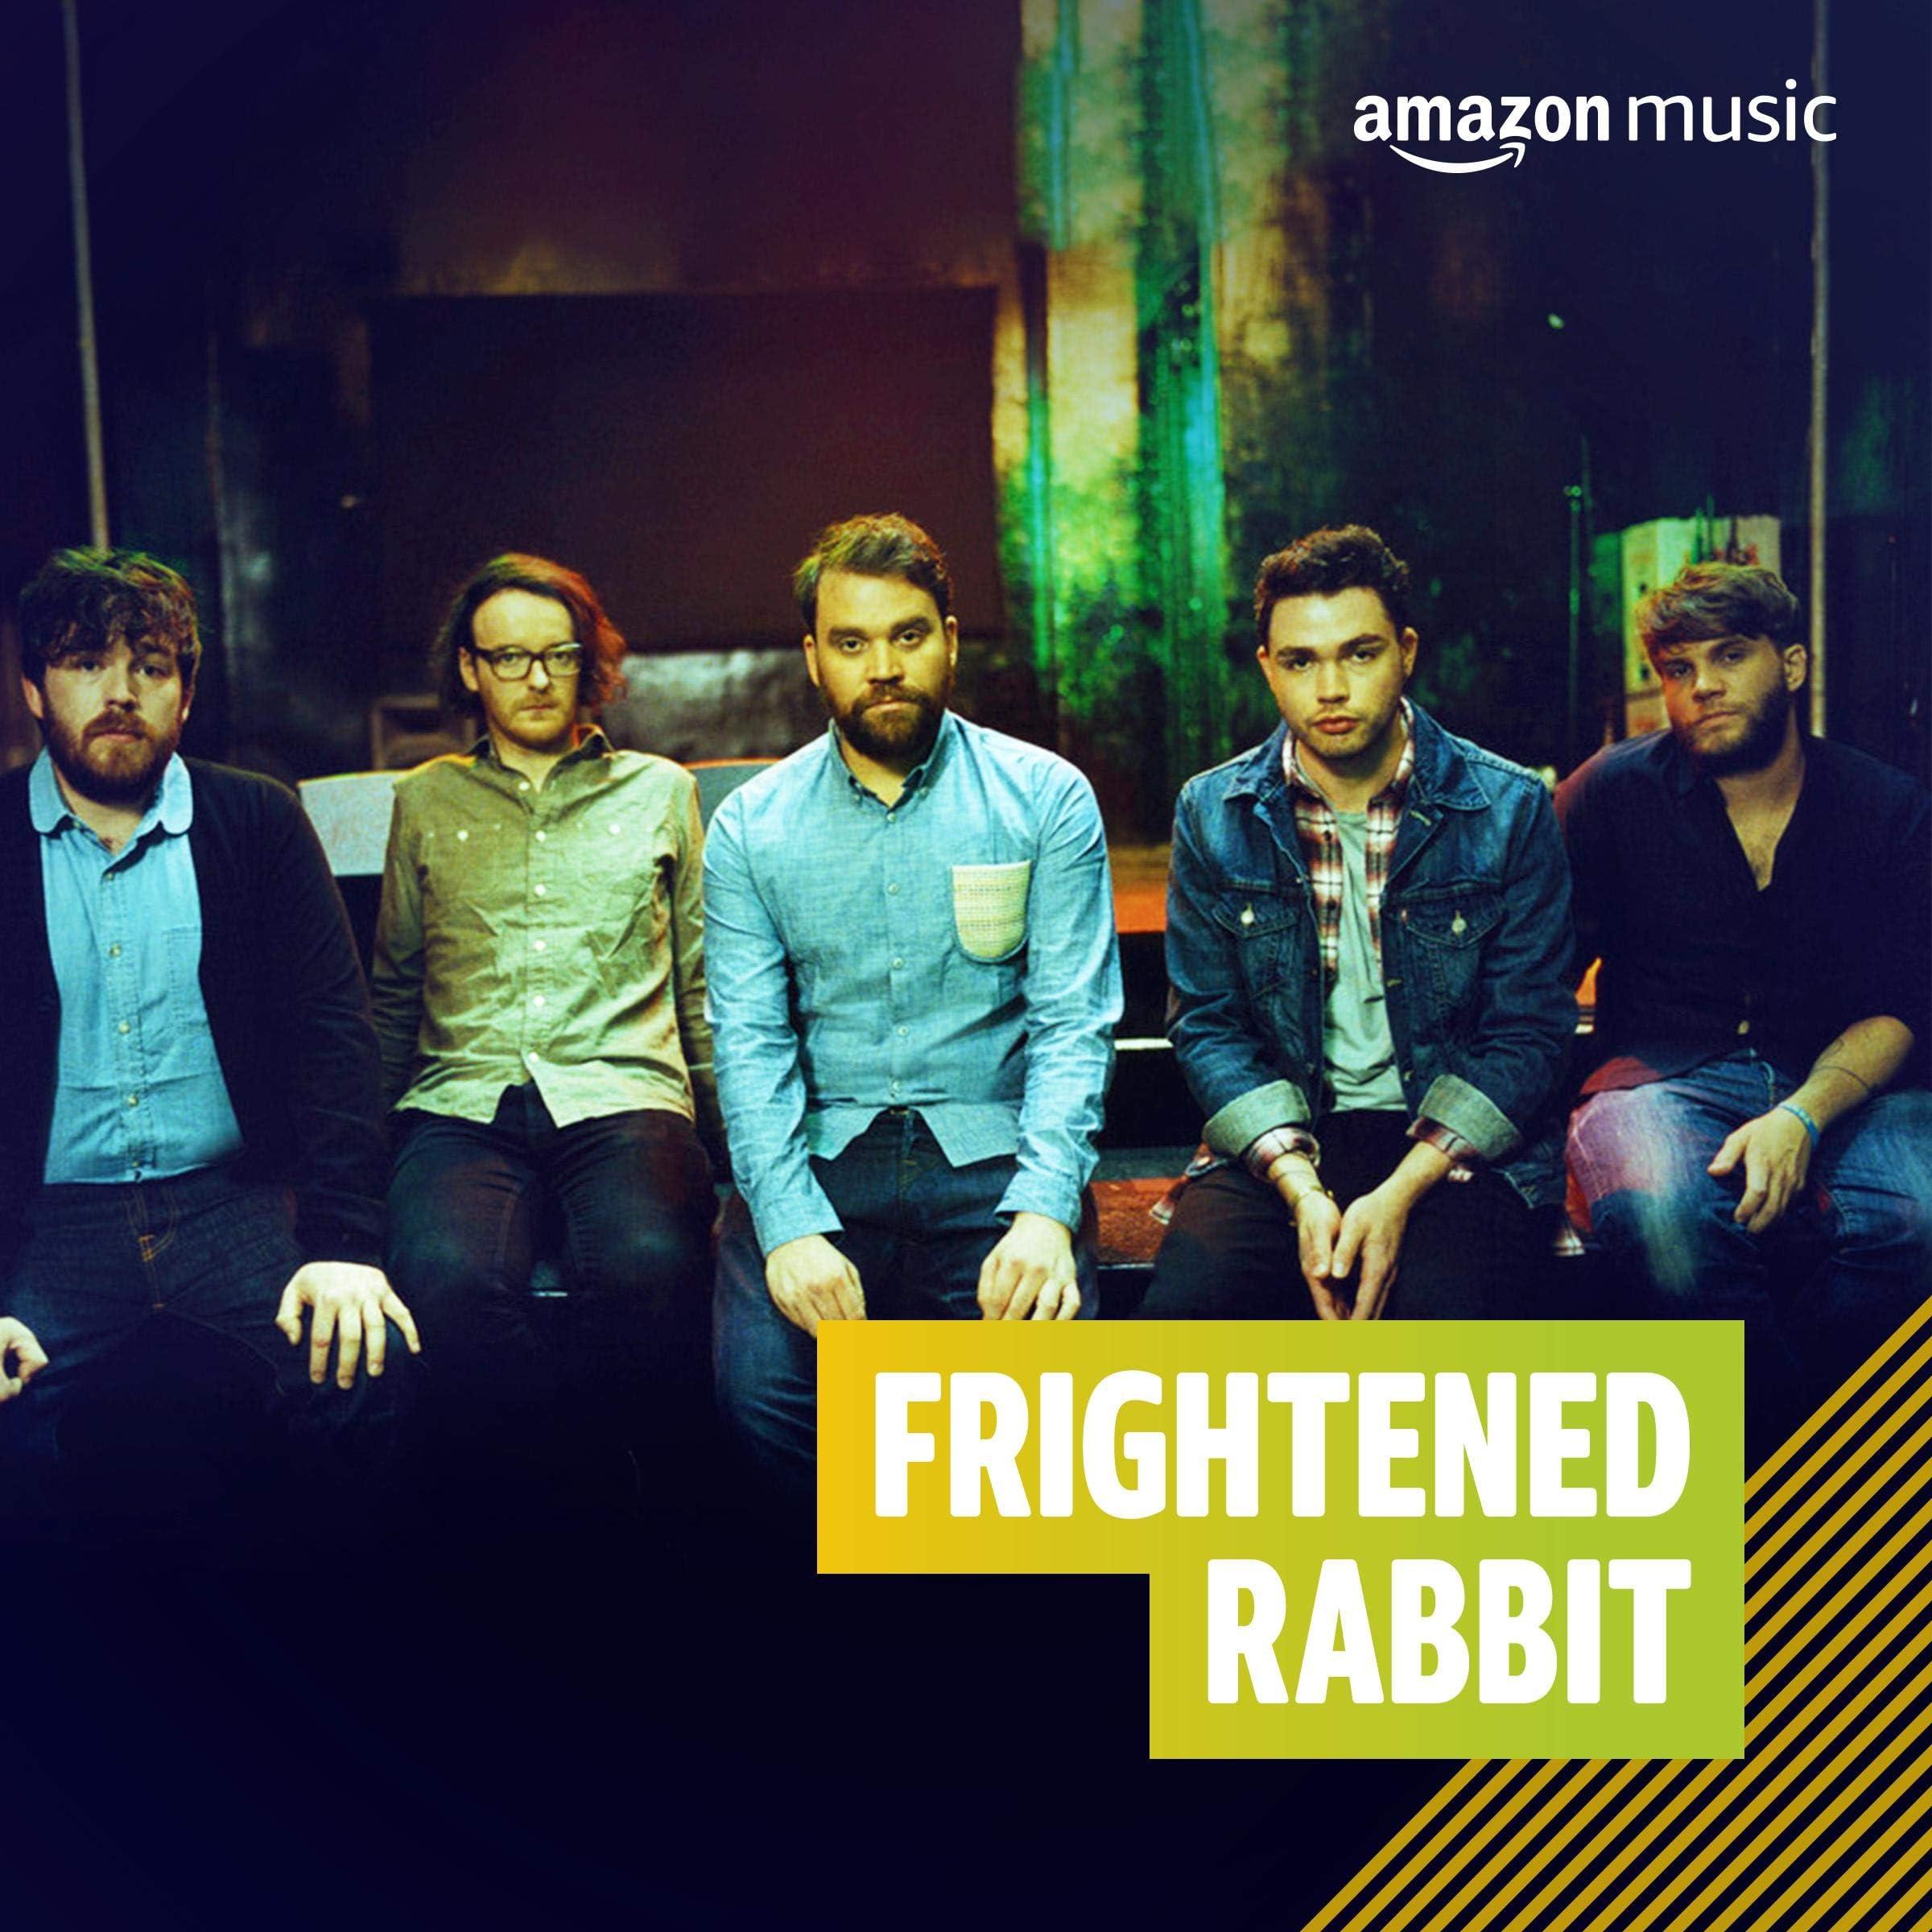 Frightened Rabbit